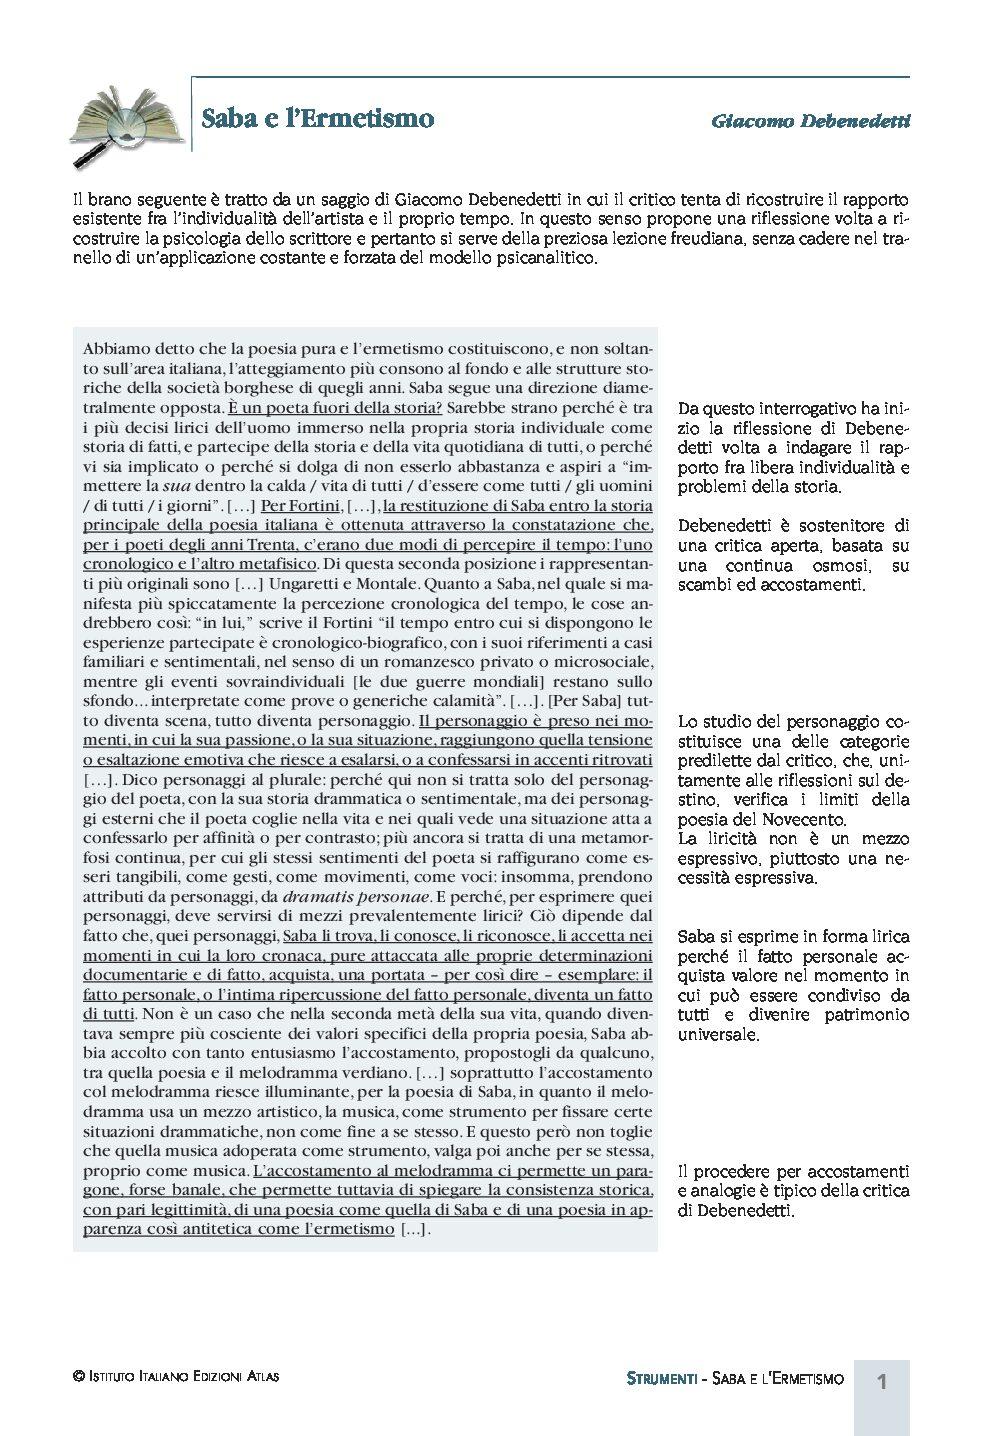 SABA E L'ERMETISMO PDF